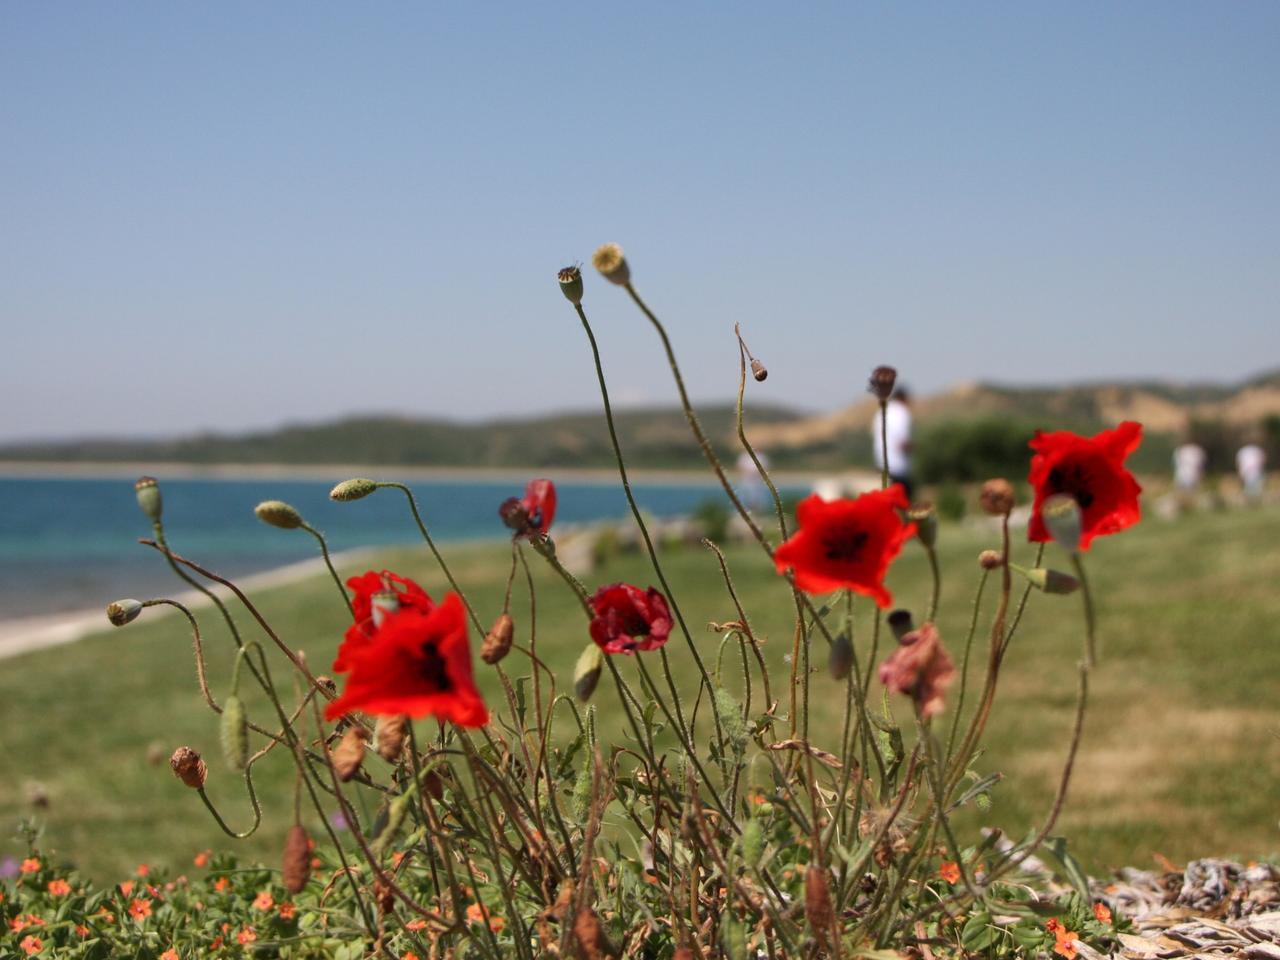 Poppies at Anzac Cove, Gallipoli